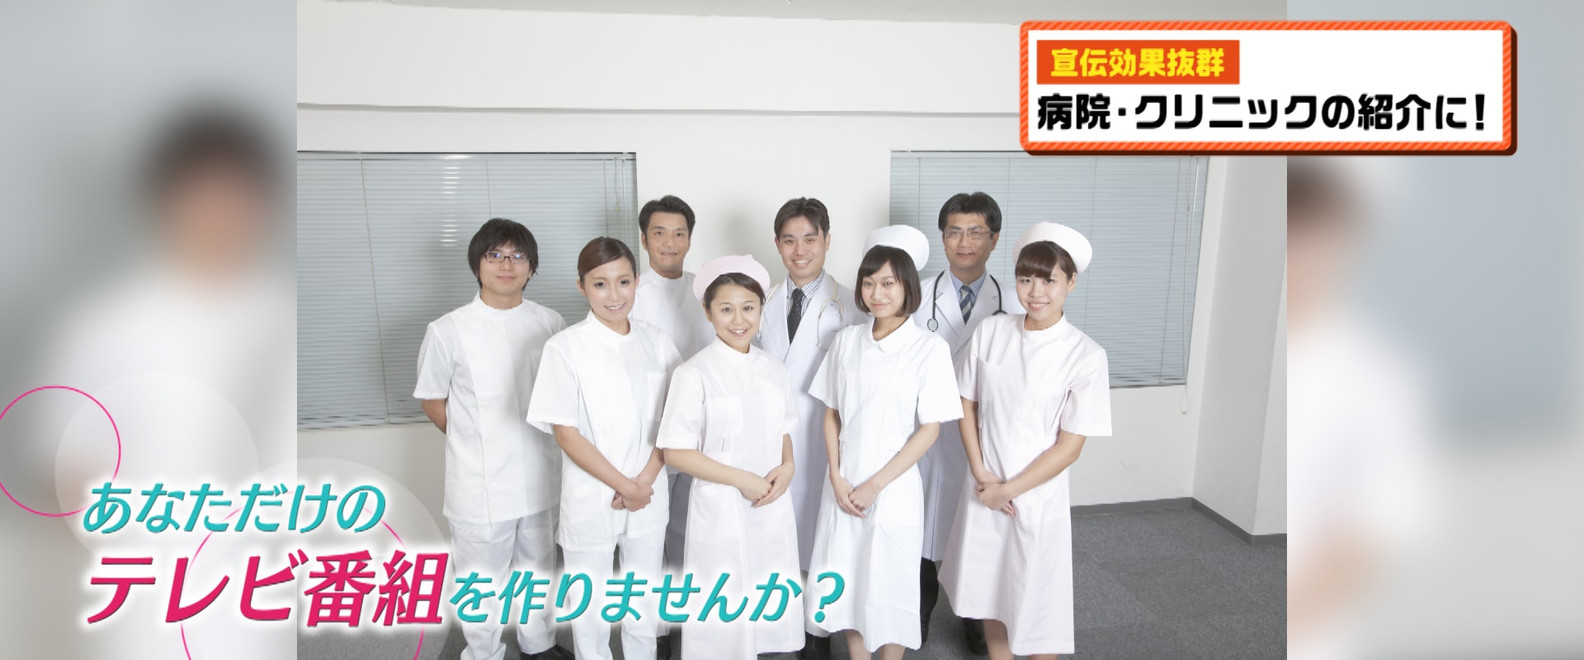 Luvas_サービス_TV (2).jpg